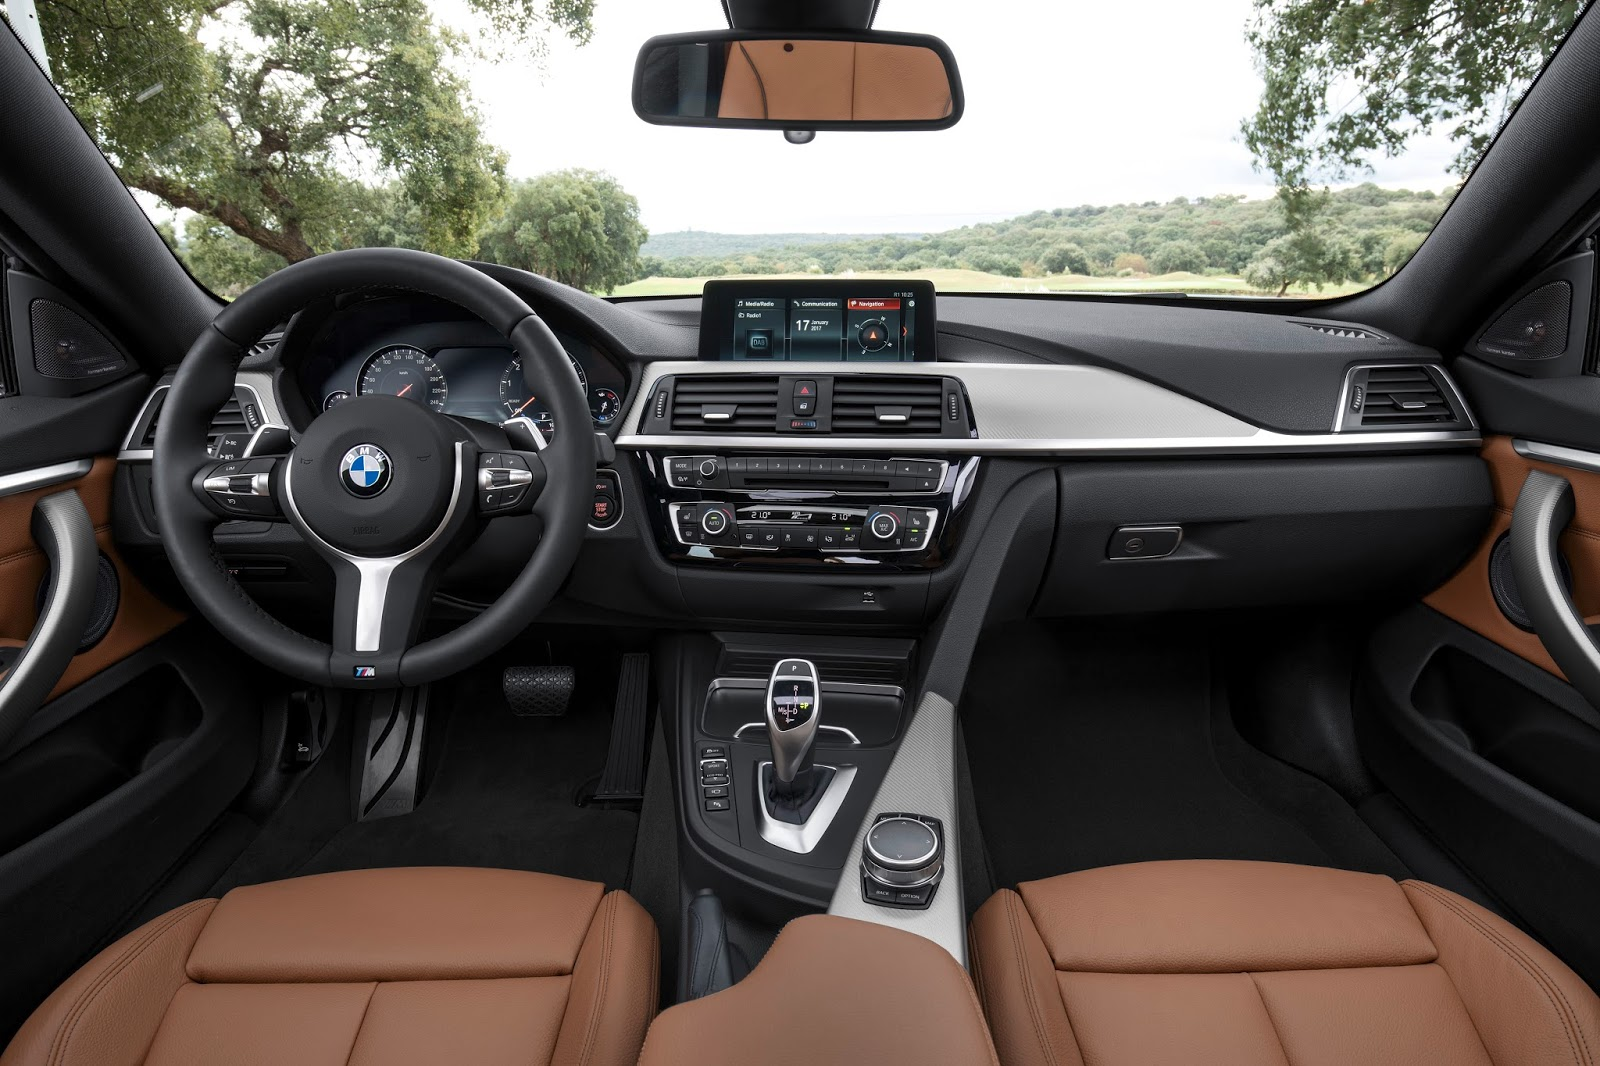 P90245302 highRes the new bmw series i Η νέα BMW Σειρά 4, με πιο σφιχτή ρύθμιση ανάρτησης BMW, Bmw 4, BMW 4 Cabrio, BMW 4 Coupe, BMW 4 Gran Coupé, Facelift